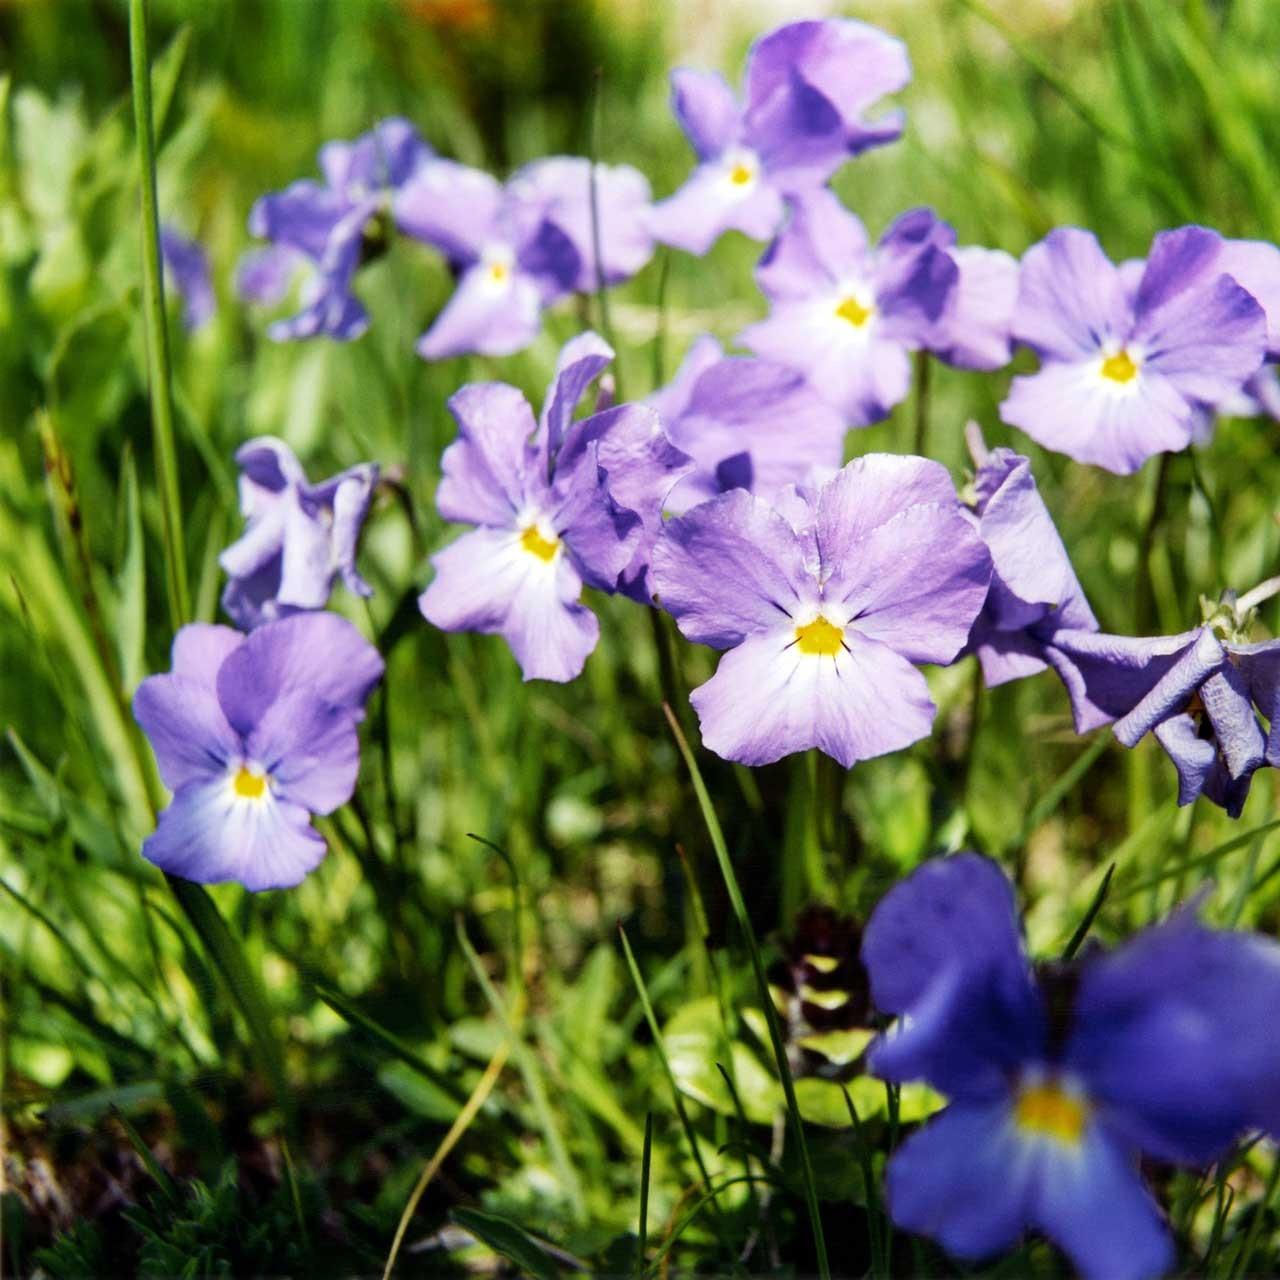 Laure-Maud_11_photographe_jardin-fleurs-montagne_01